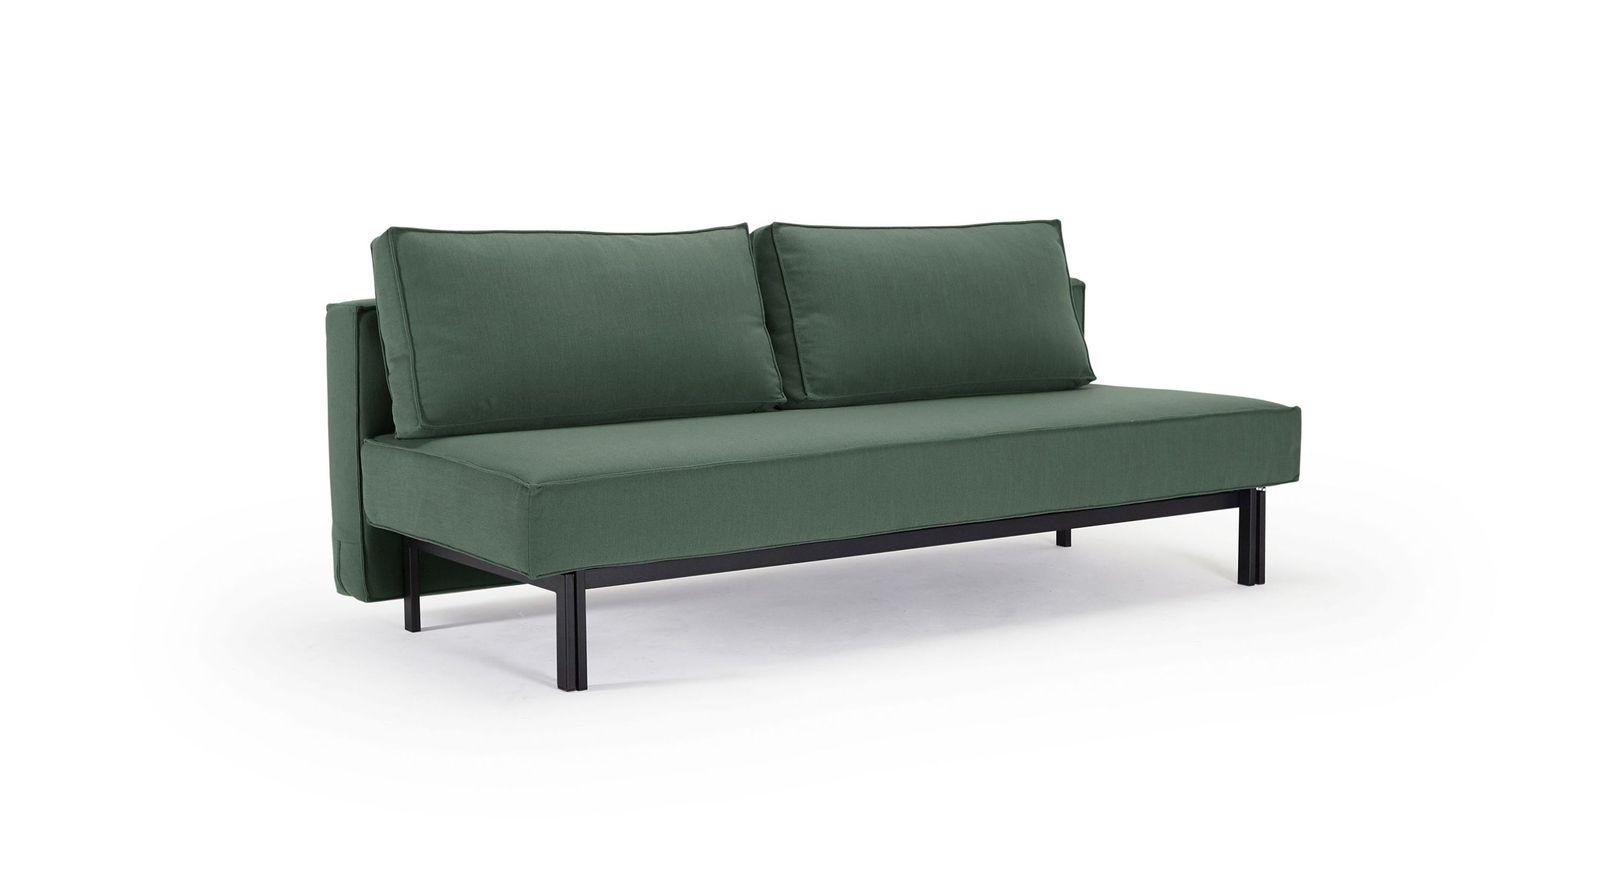 Modernes Schlafsofa Ellwood in grünem Bezug aus Elegance